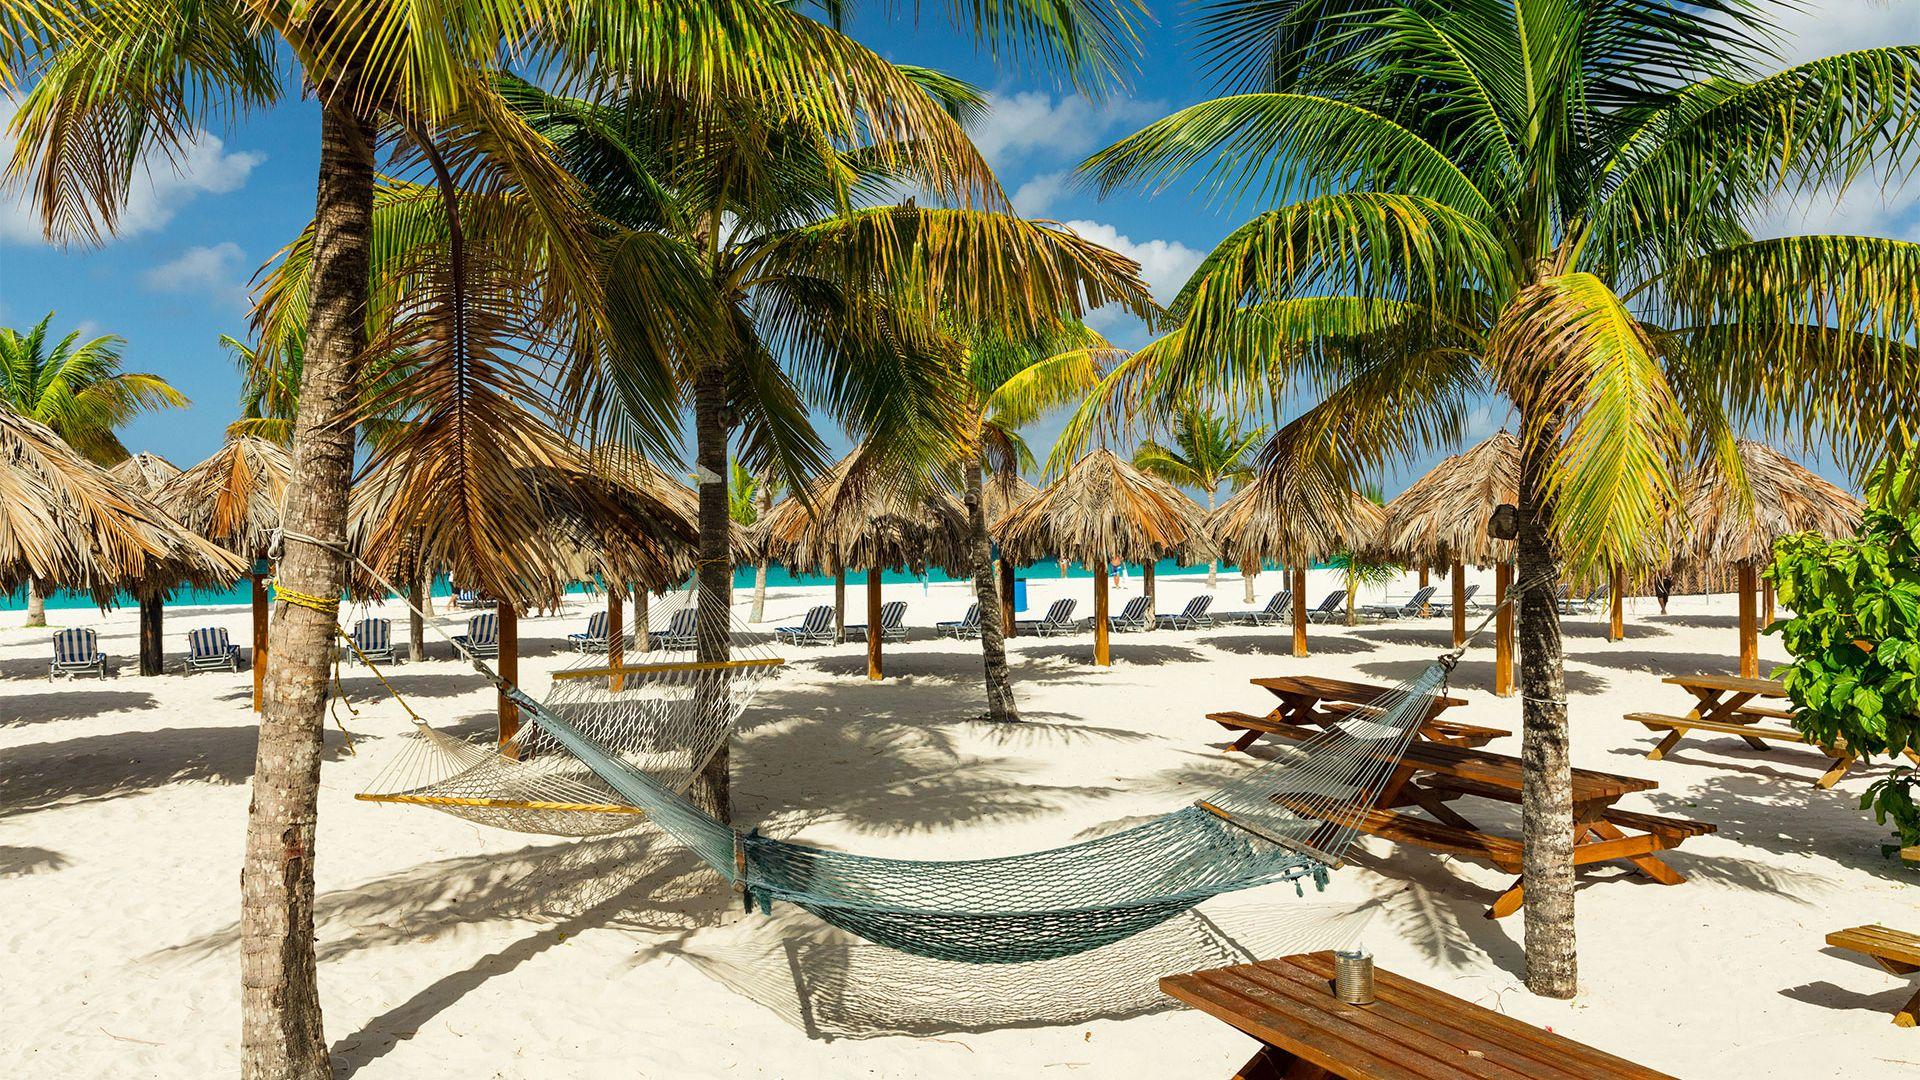 Sejur plaja Barbados, 9 zile - noiembrie 2021